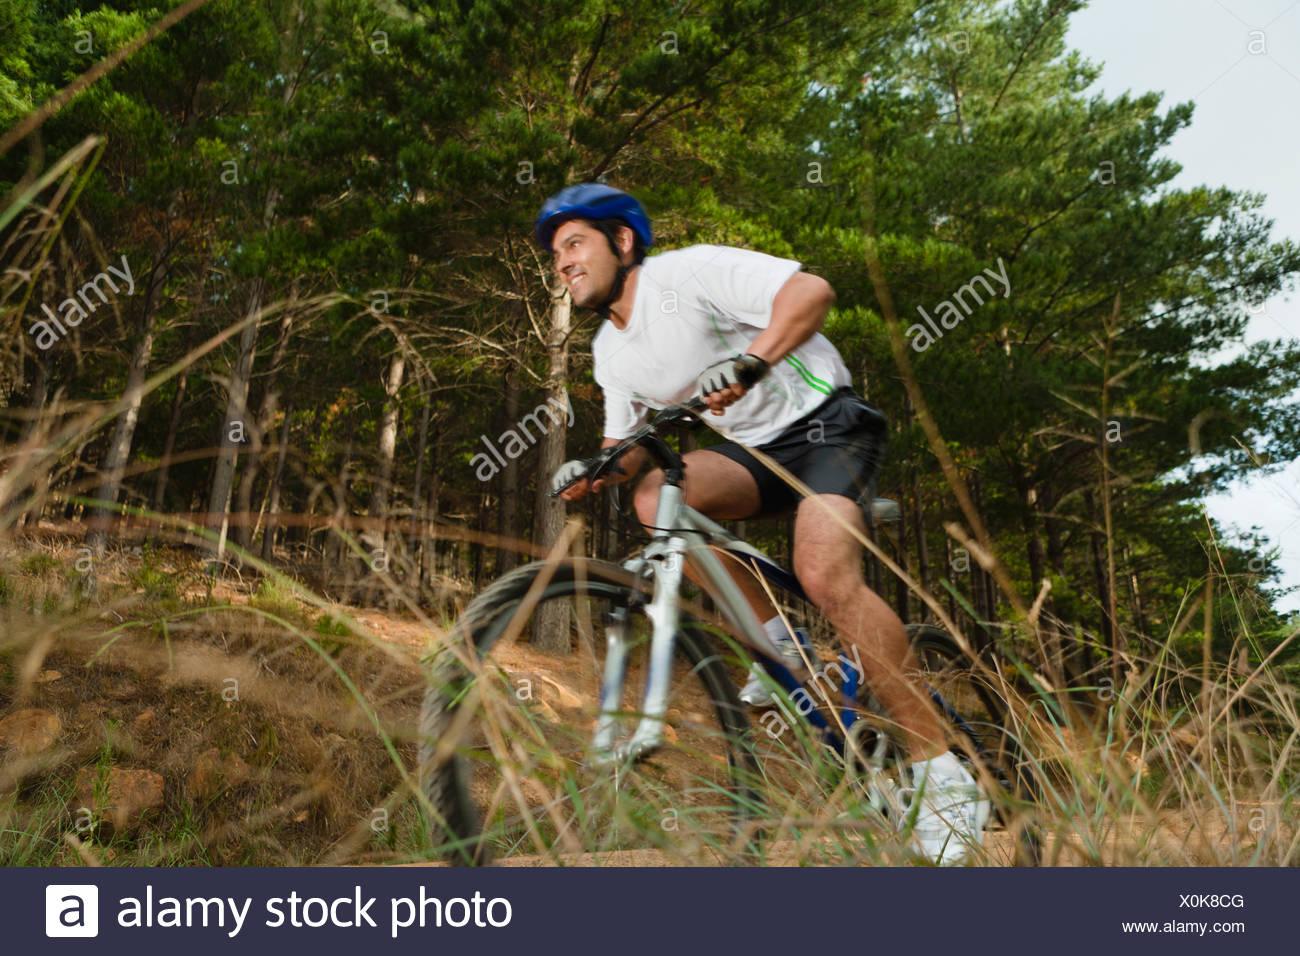 Man mountain biking on dirt path - Stock Image